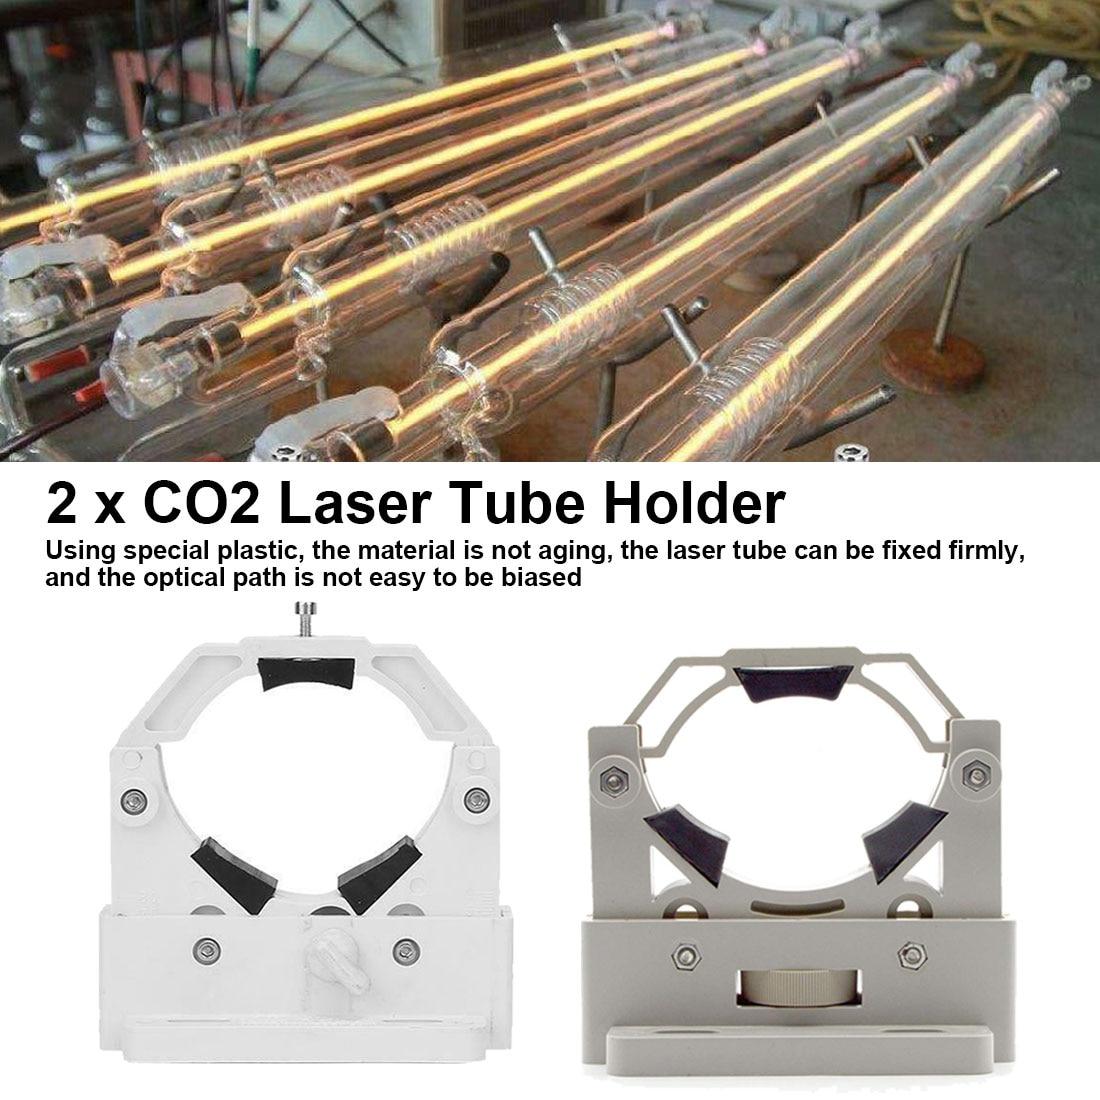 Plastic Laser Tube Support Holder Adjust Dia.50-80mm Flexible Plastic Support For CO2 Laser Engraving Machine 2Pcs/Lot